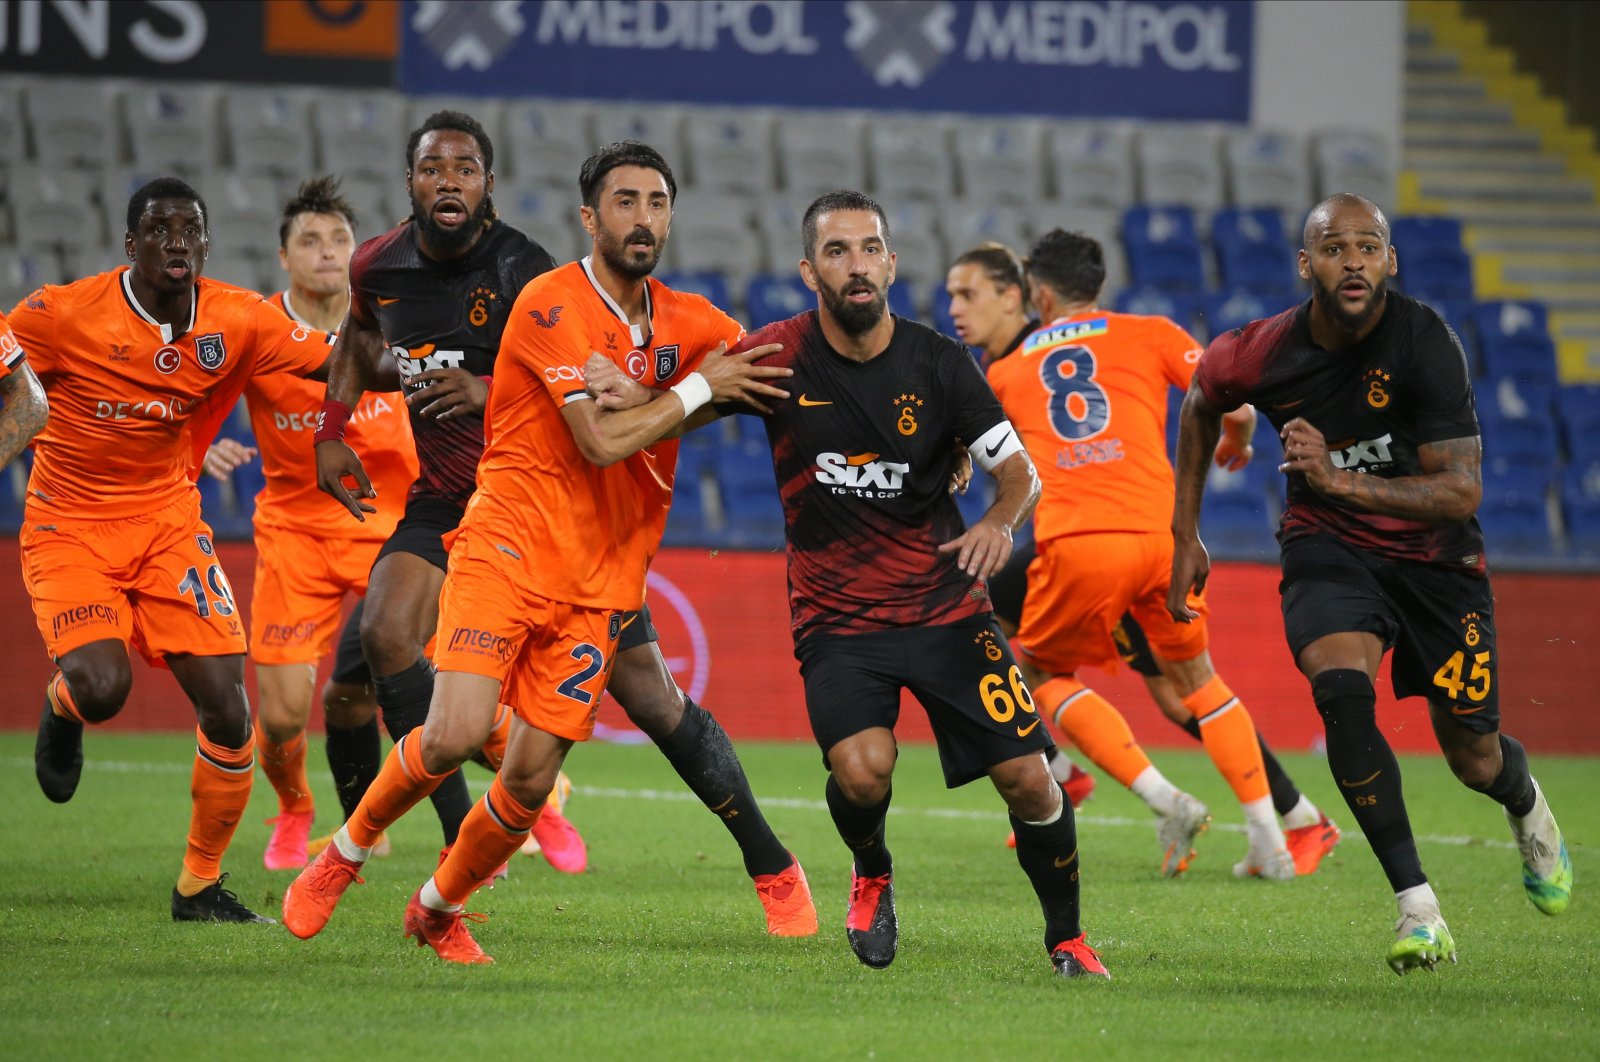 Galatasaray defeats Medipol Başakşehir 2-0 in 2nd game of the 2020-2021 Turkish Süper Lig season, Başakşehir, Turkey, Sep. 20, 2020. (IHA Photo)